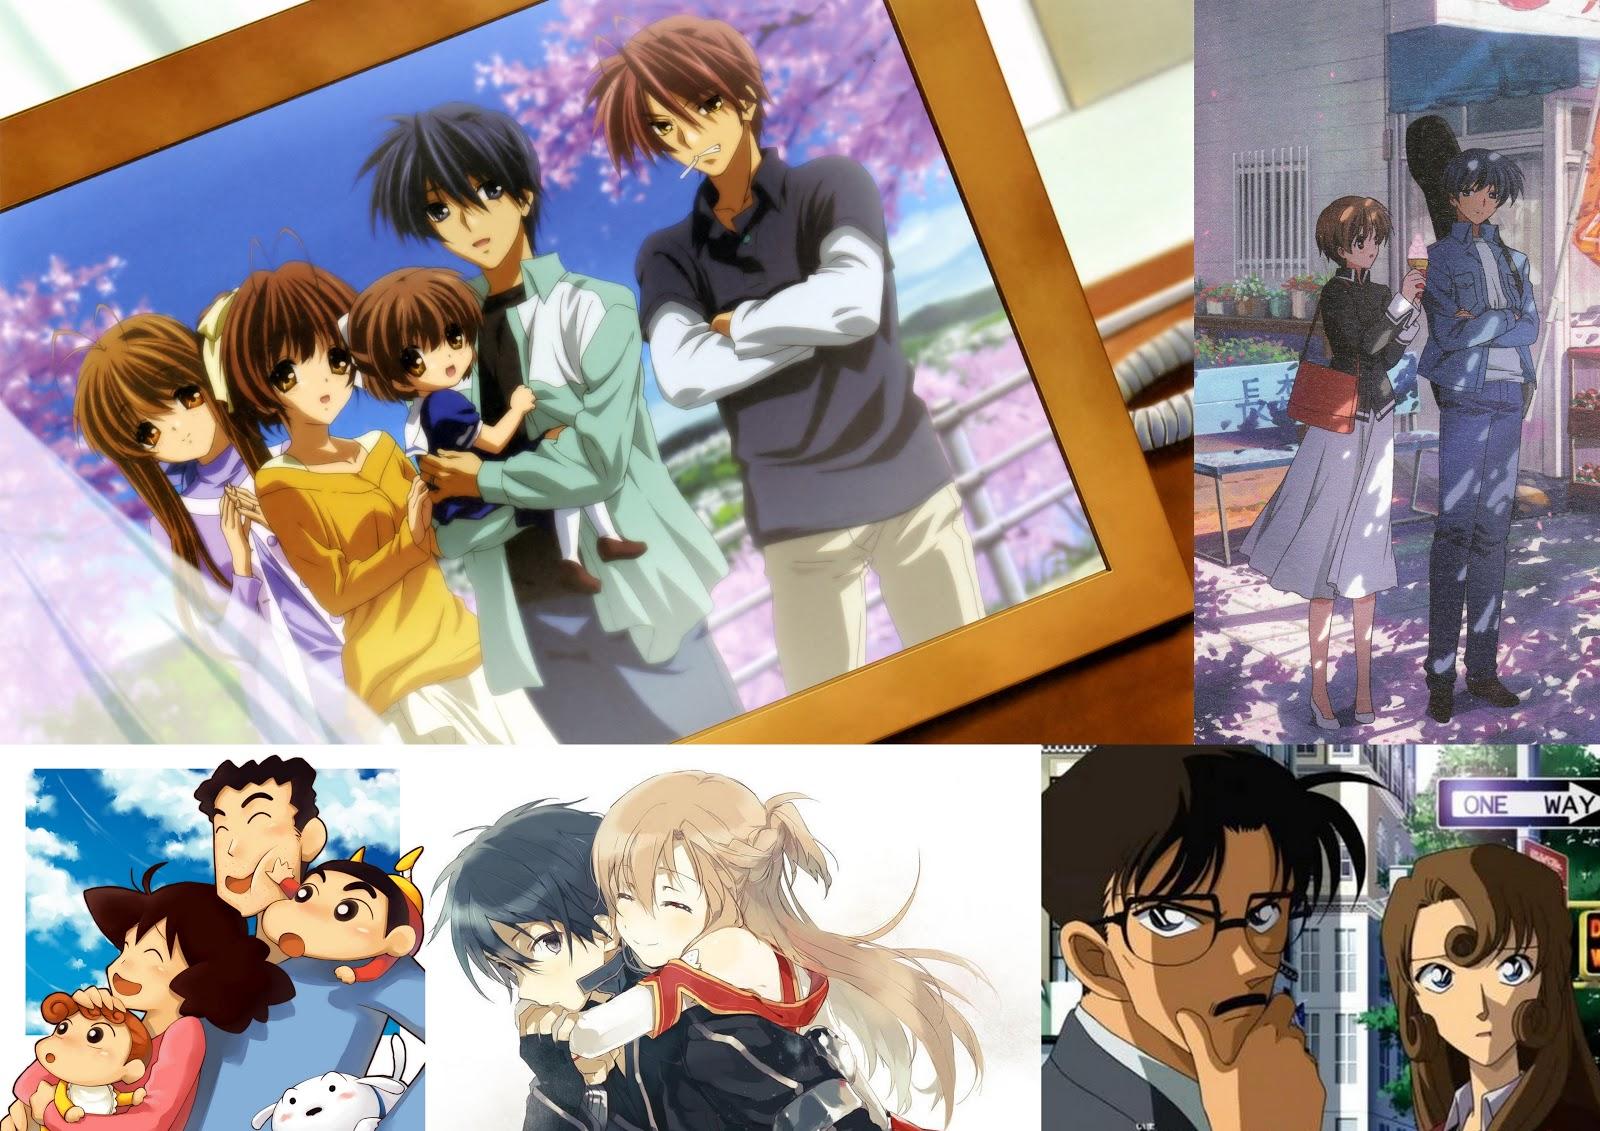 Anime Casada No Cio Contos Eroticos Playboy Fani Bbb De Abril